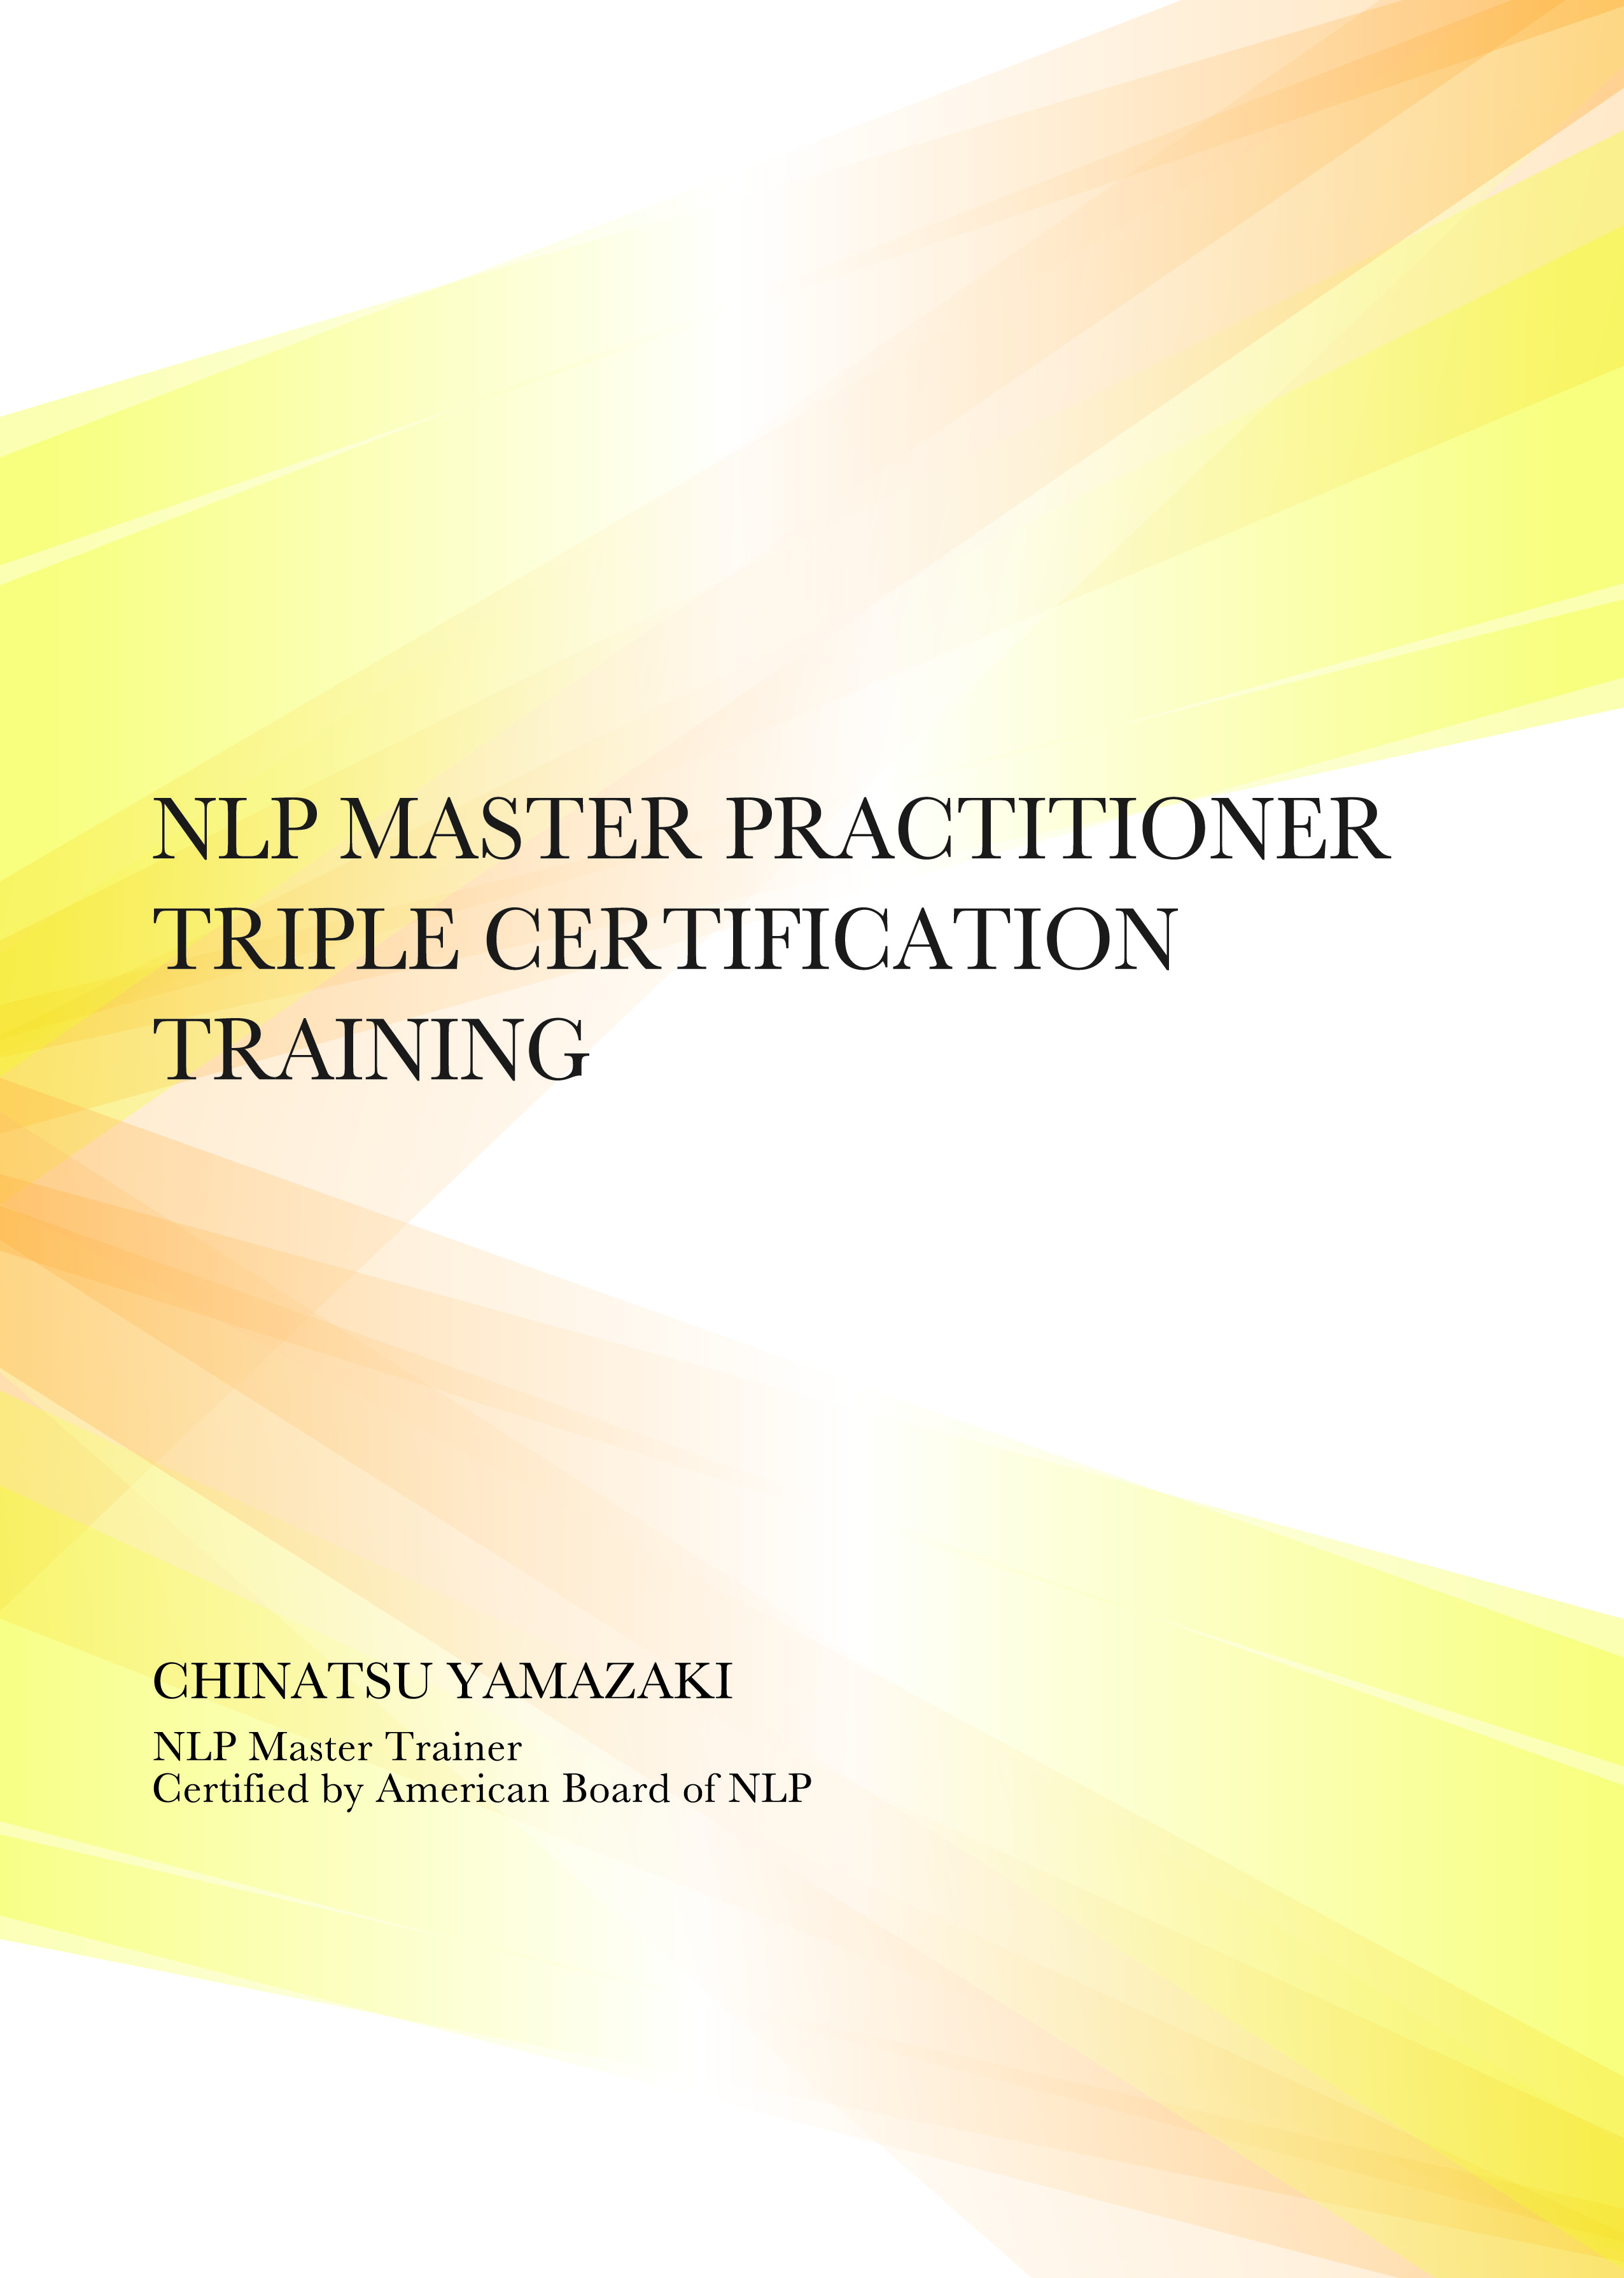 NLP Master Practitioner Certification Training